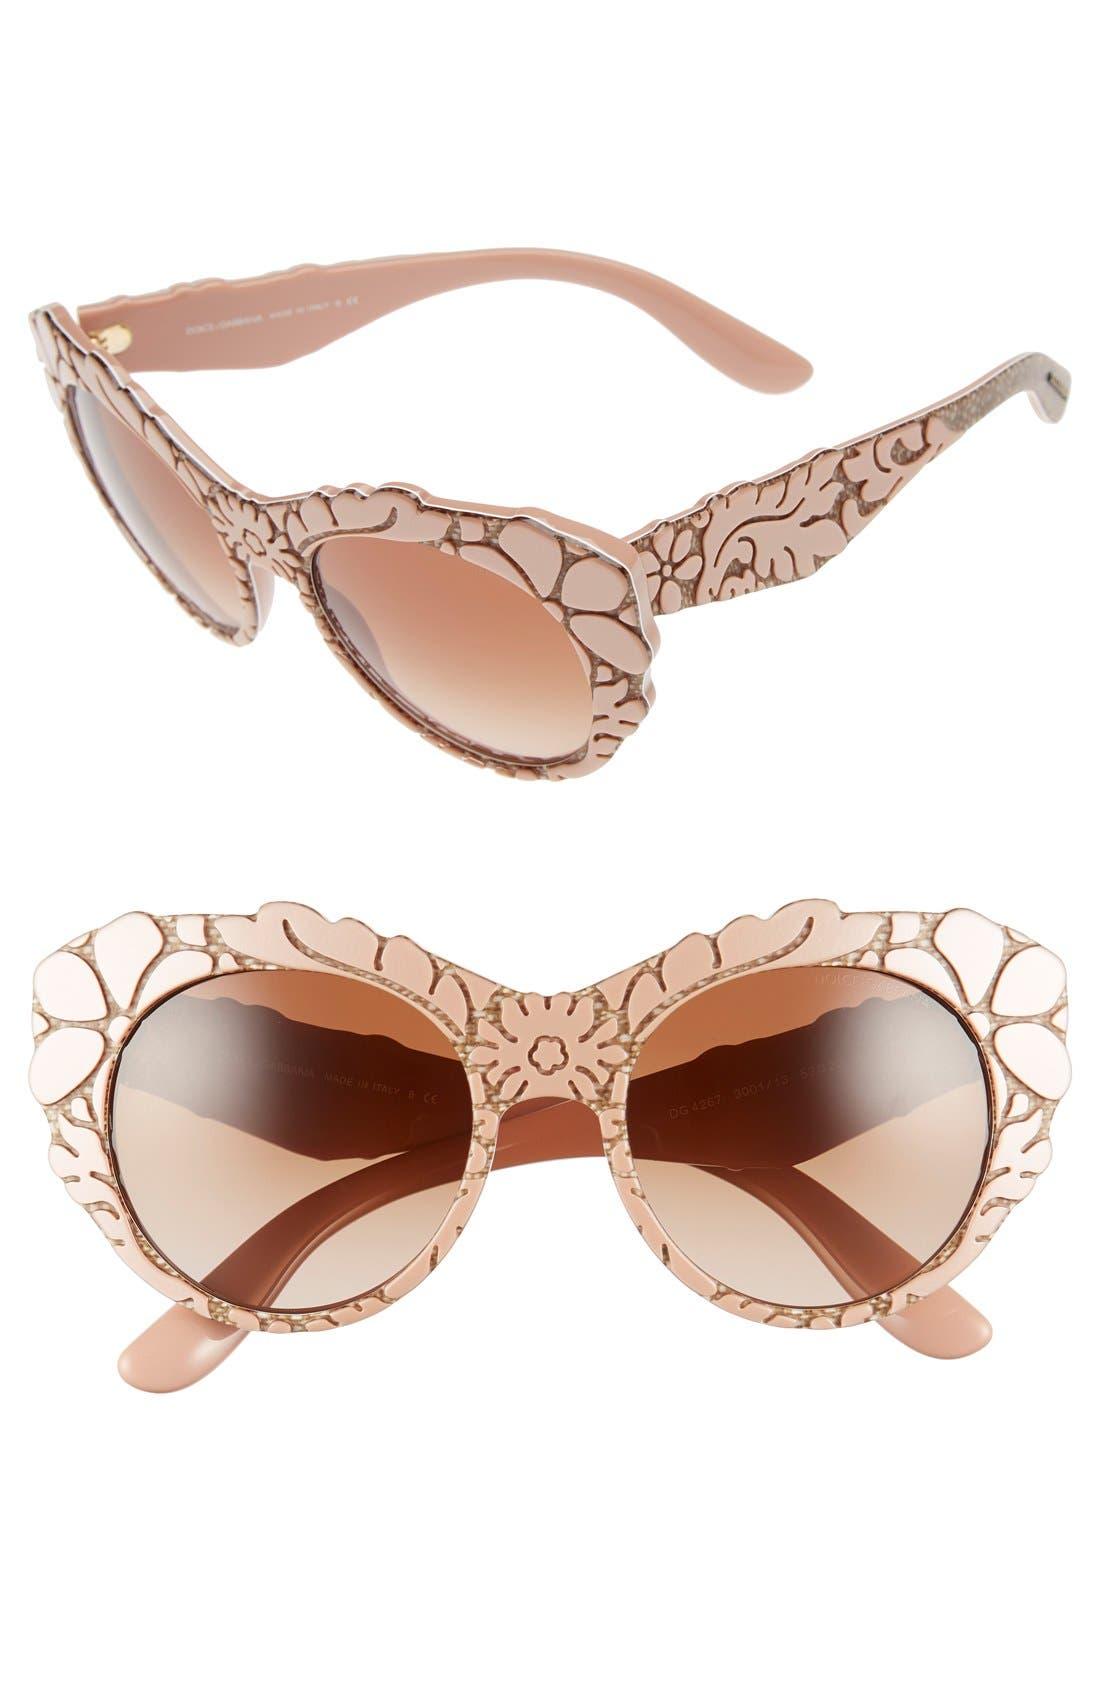 Main Image - Dolce&Gabbana 53mm Sunglasses